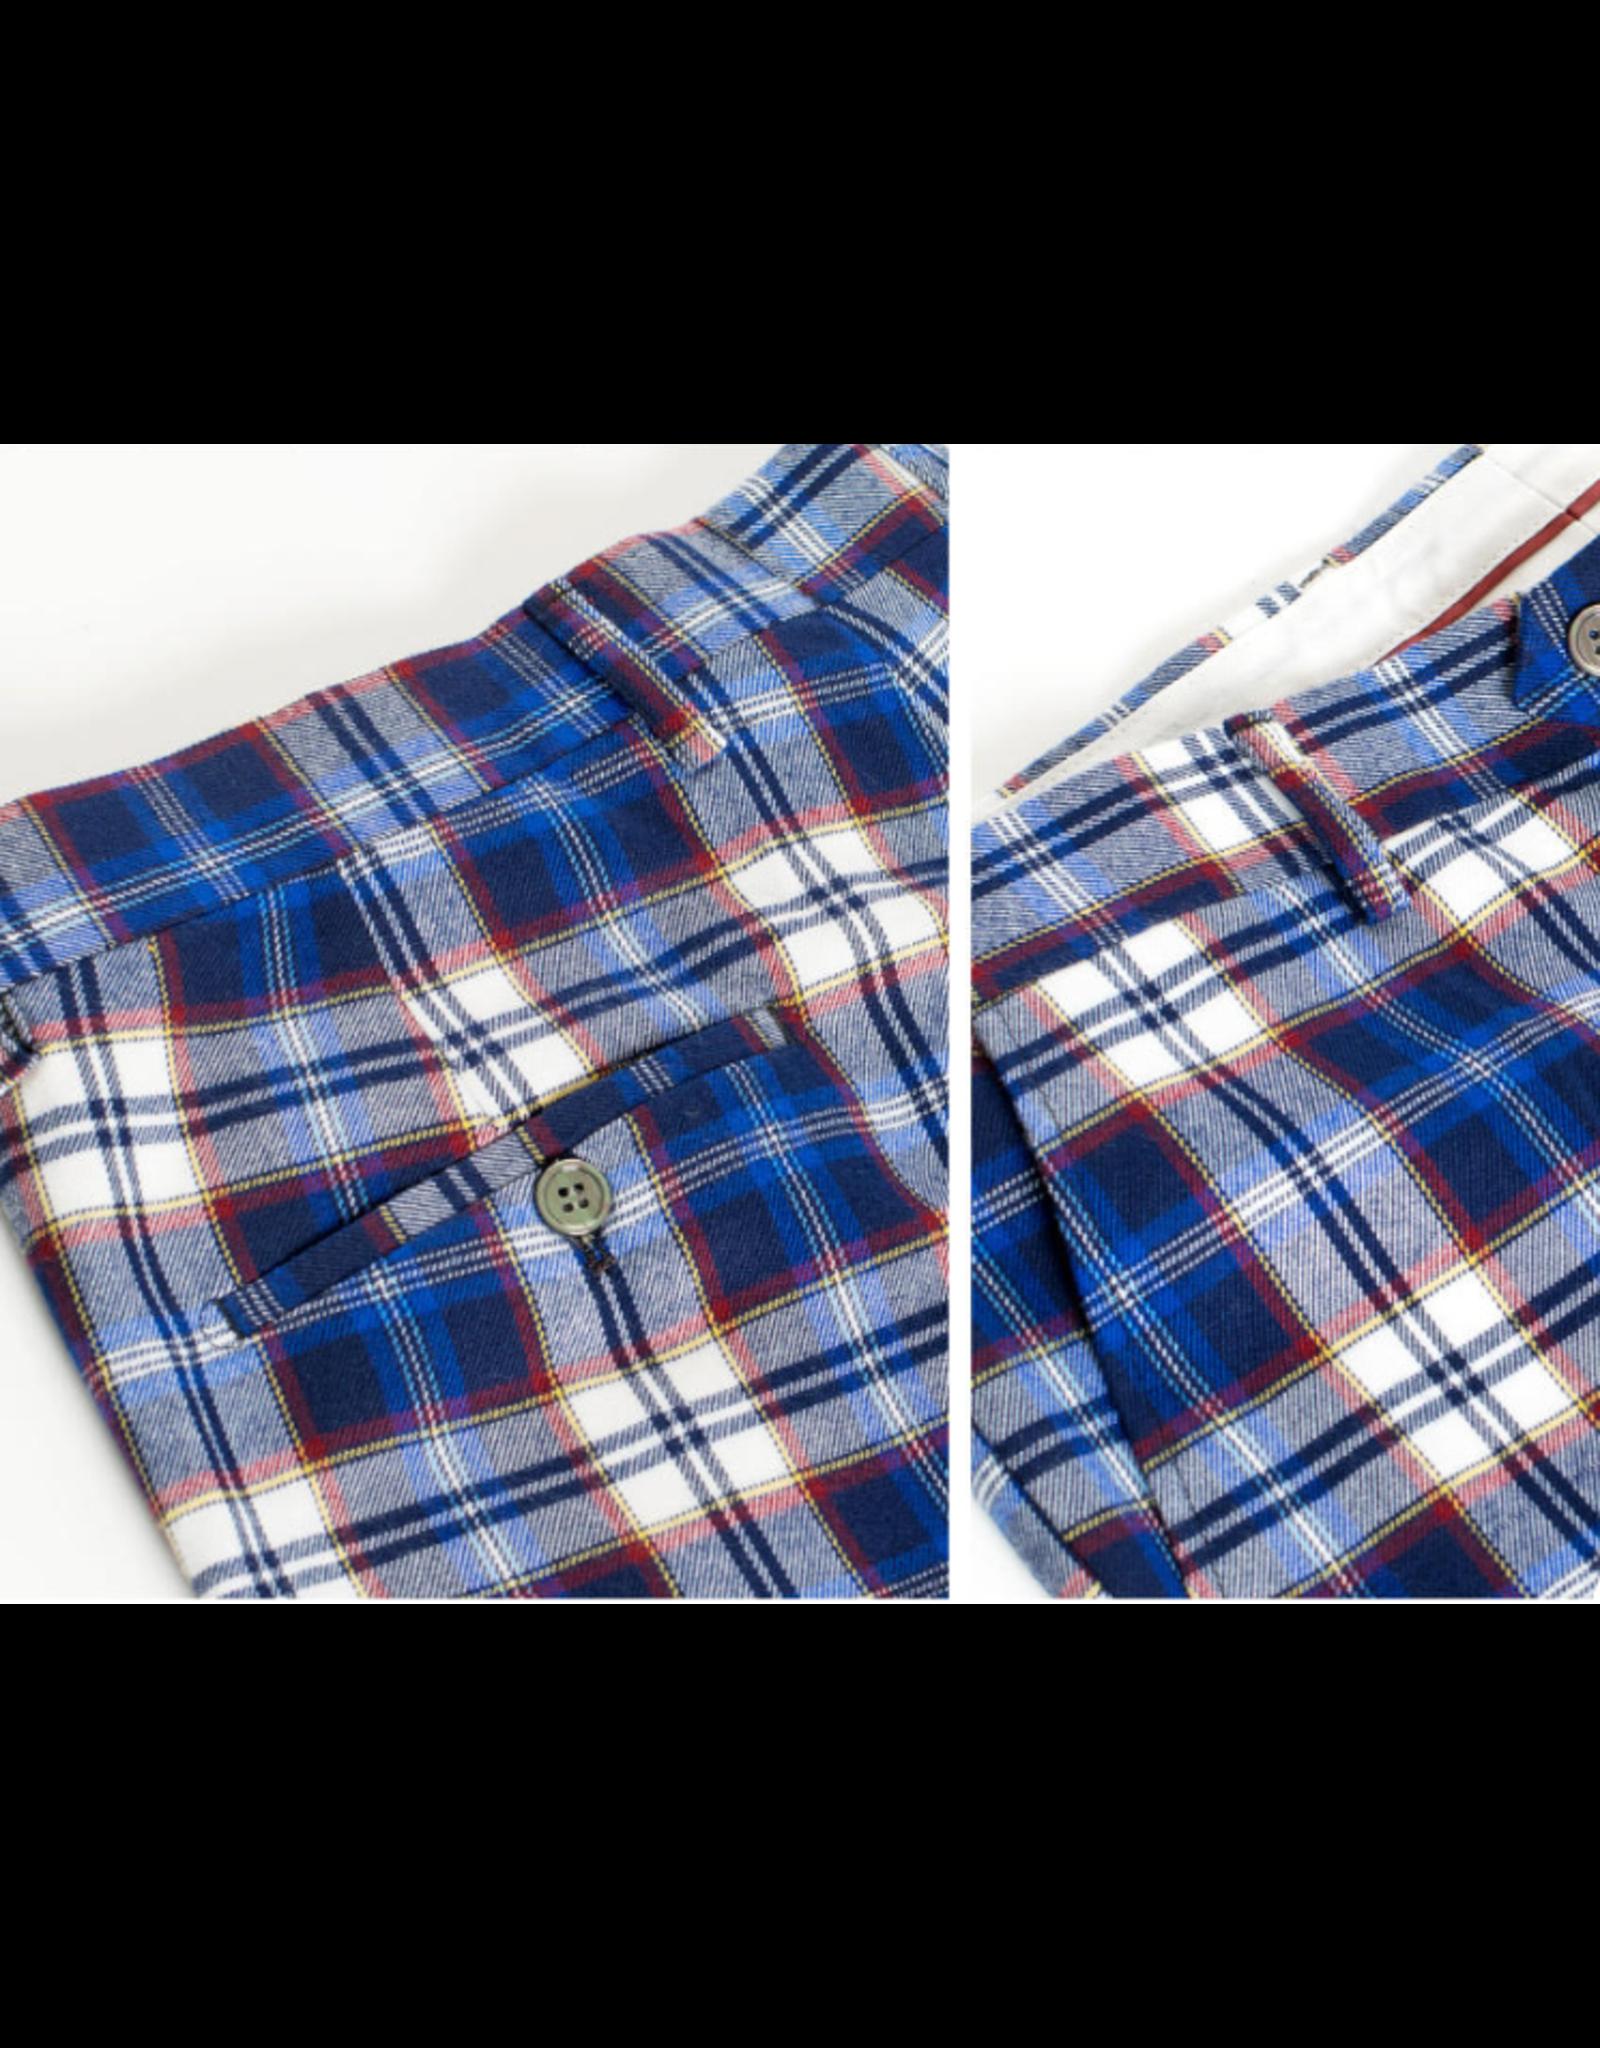 Barabas Barabas Slim Fit Pant - CP46 Blue/White